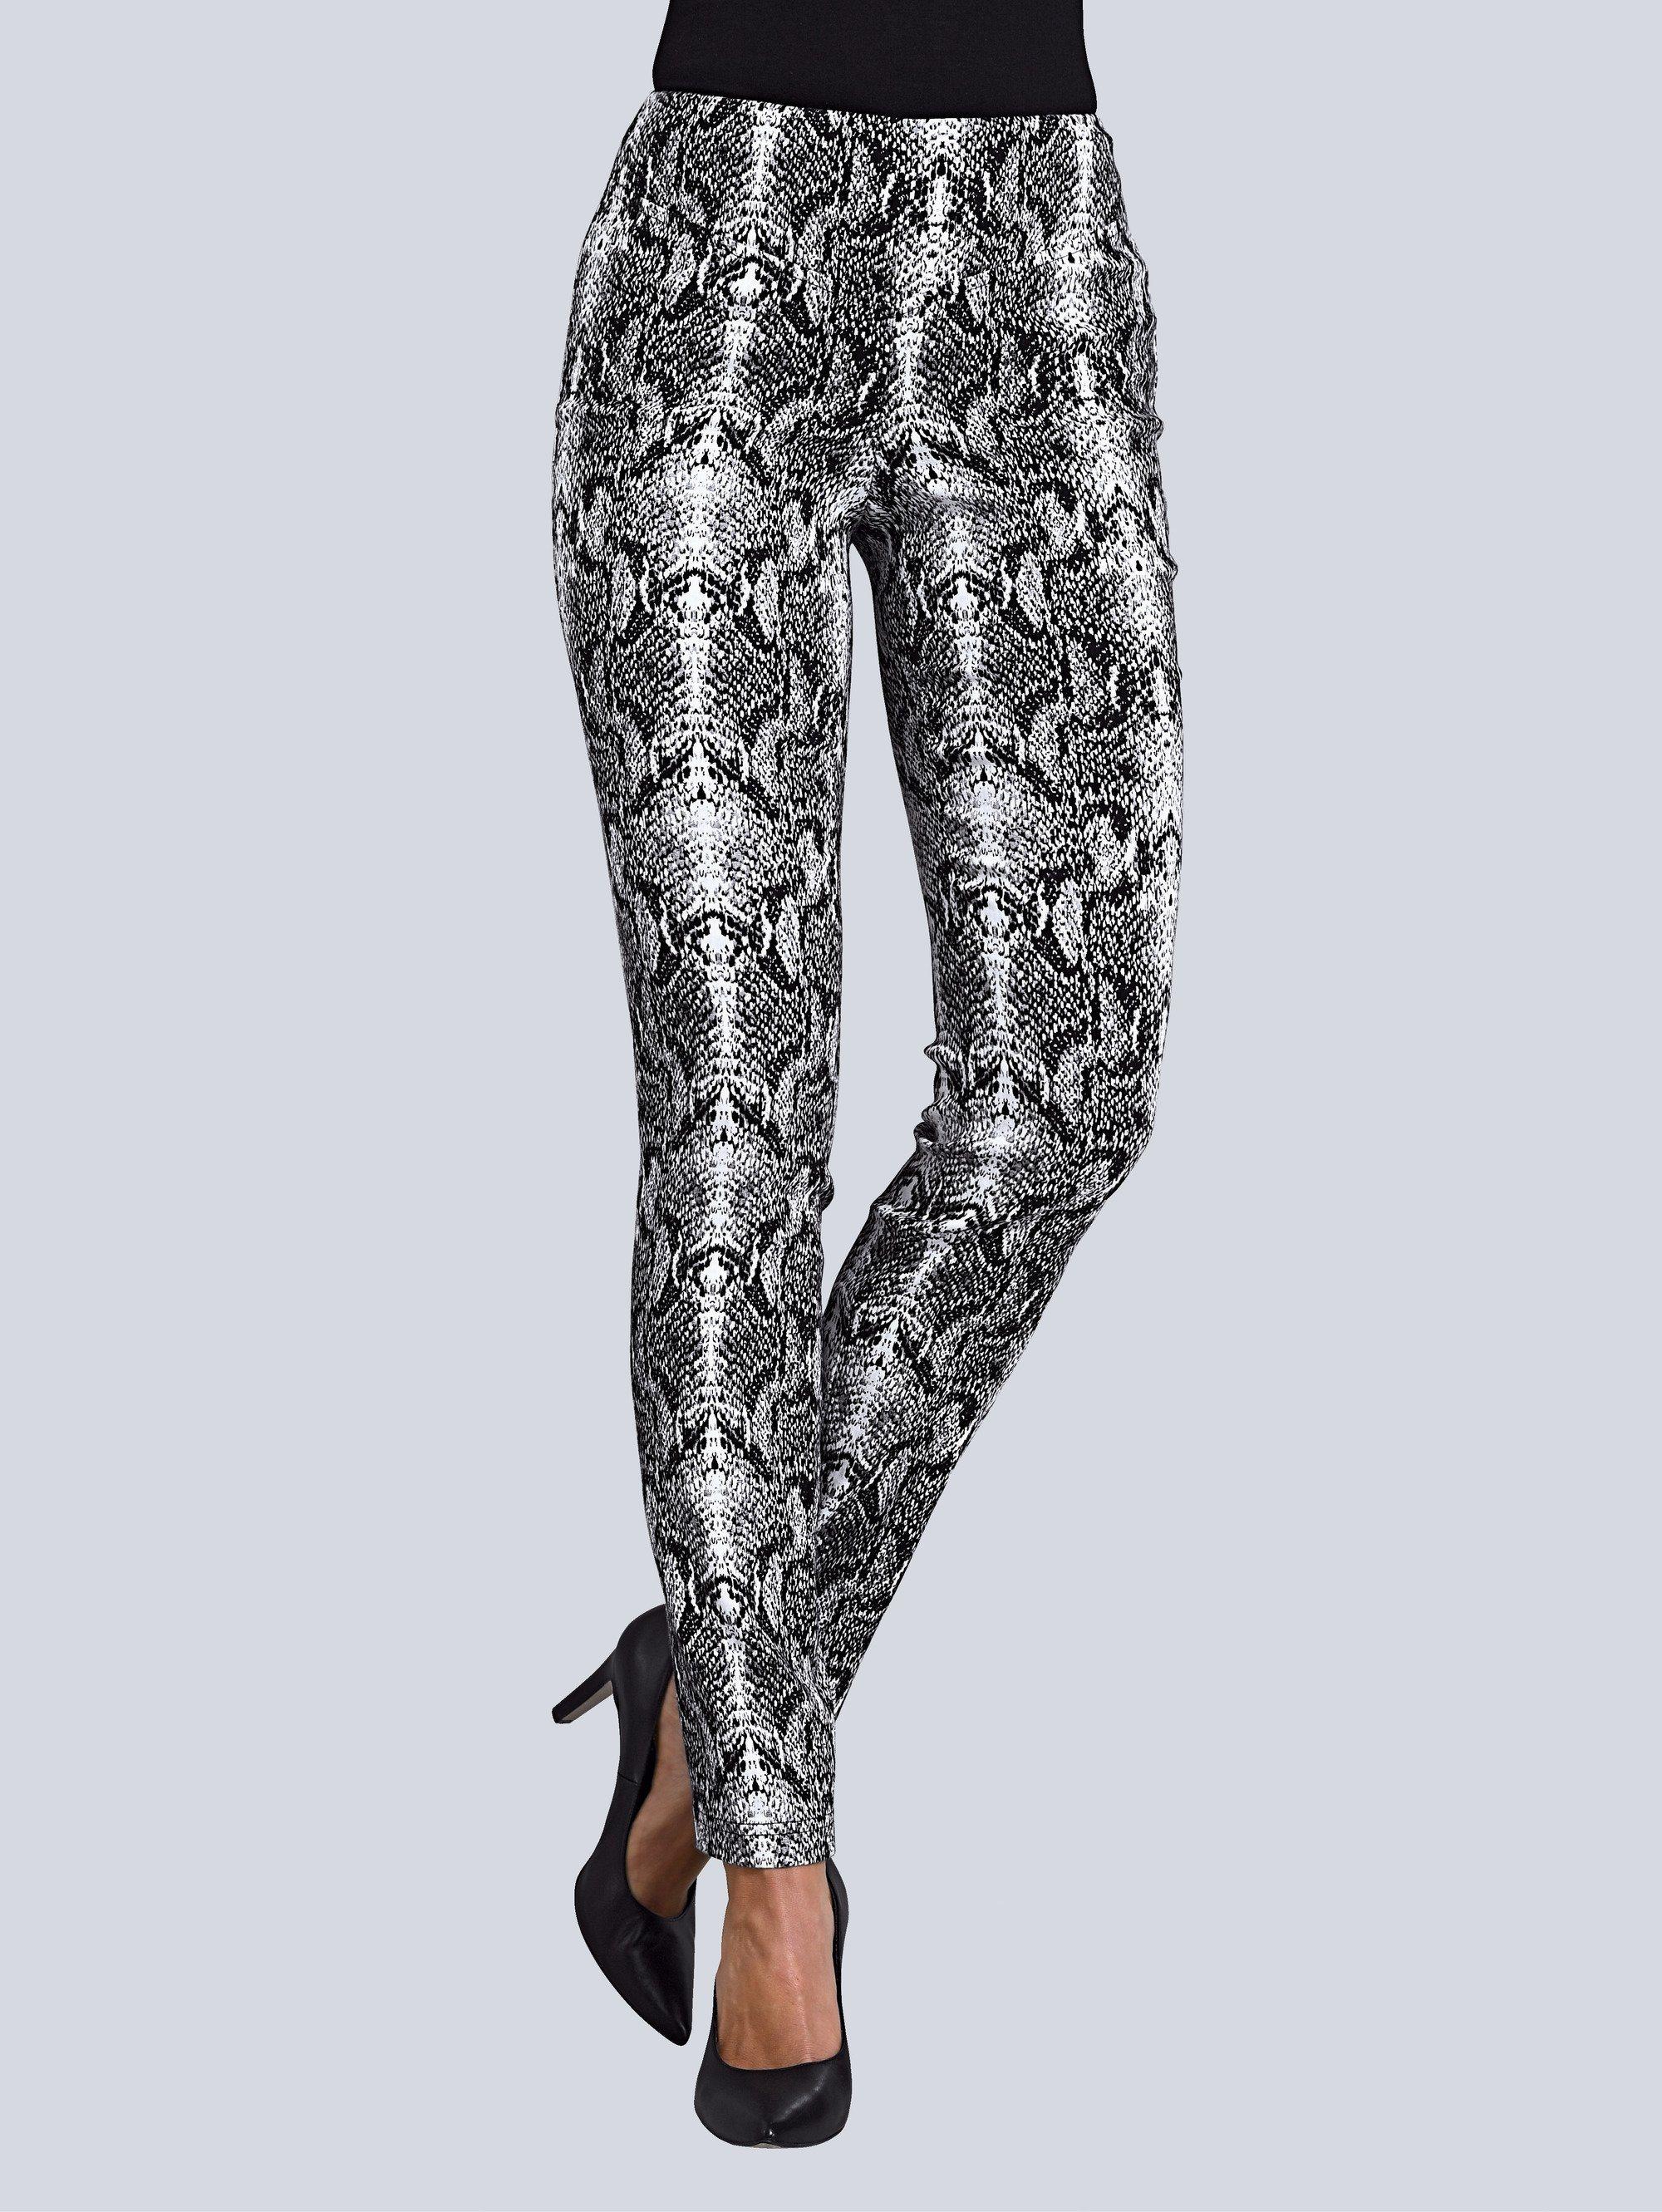 alba moda -  Hose besondere Jacquard Qualität